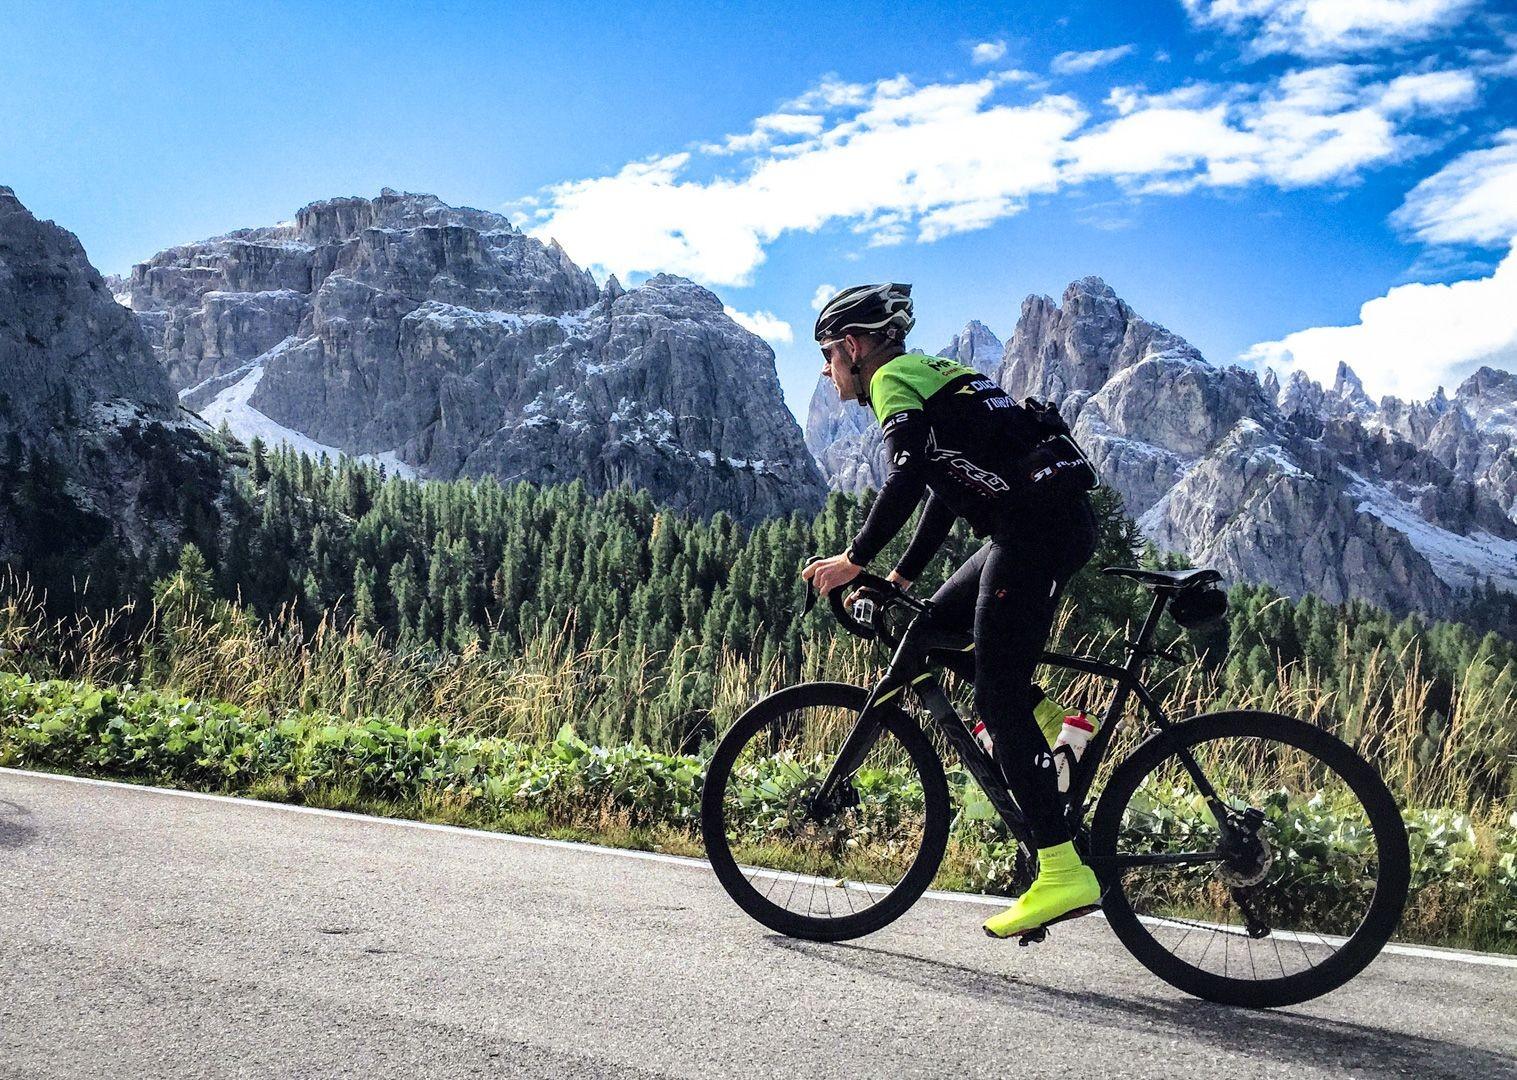 italian-dolomites-road-cycling-holiday.jpg - Italy - Raid Dolomiti - Guided Road Cycling Holiday - Italia Road Cycling